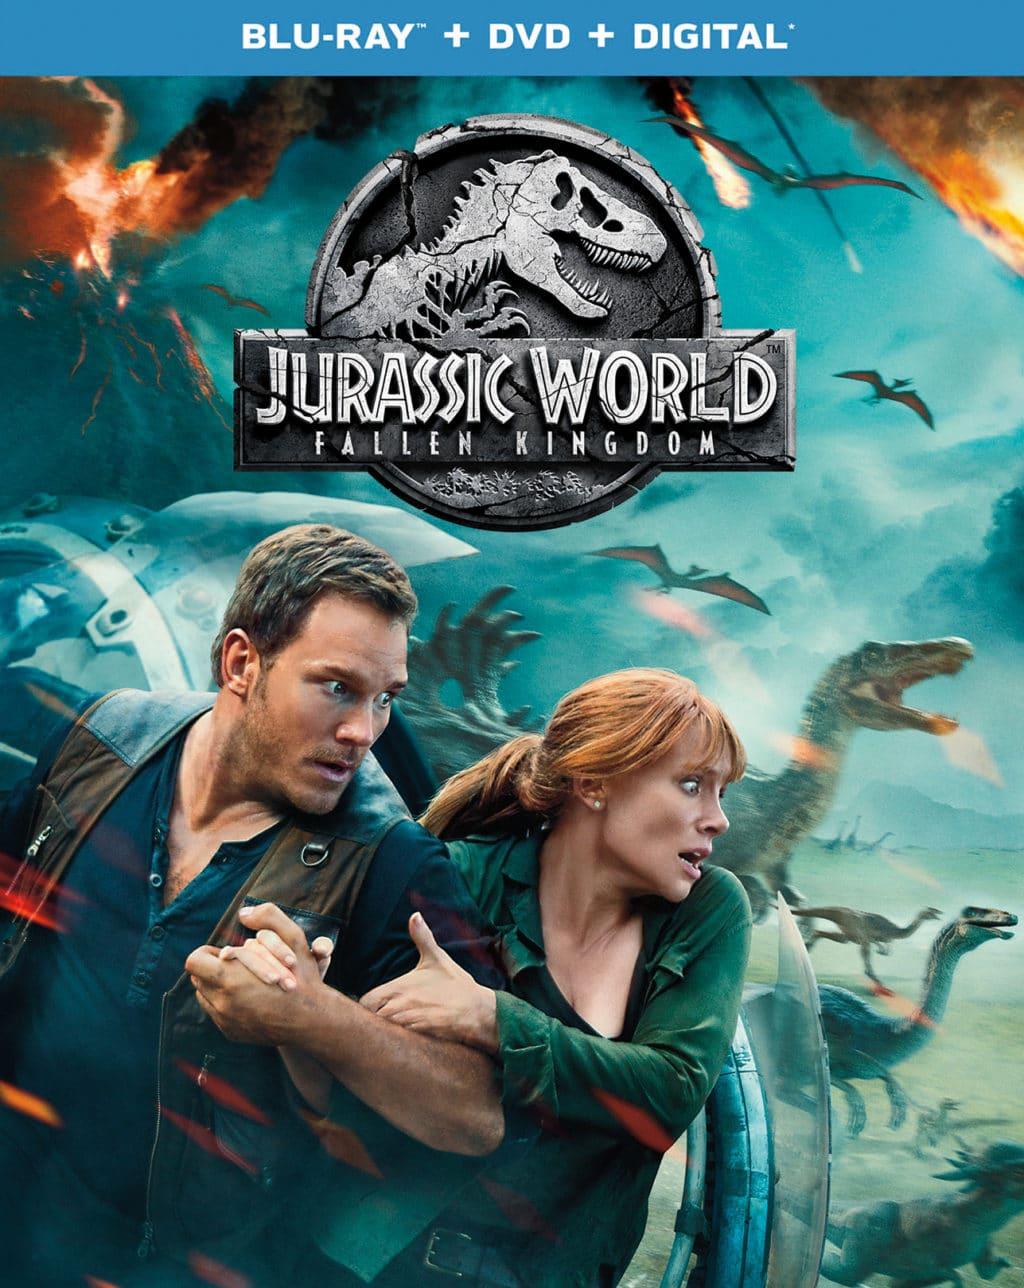 Jurassic World Fallen Kingdom DVD Release Dates